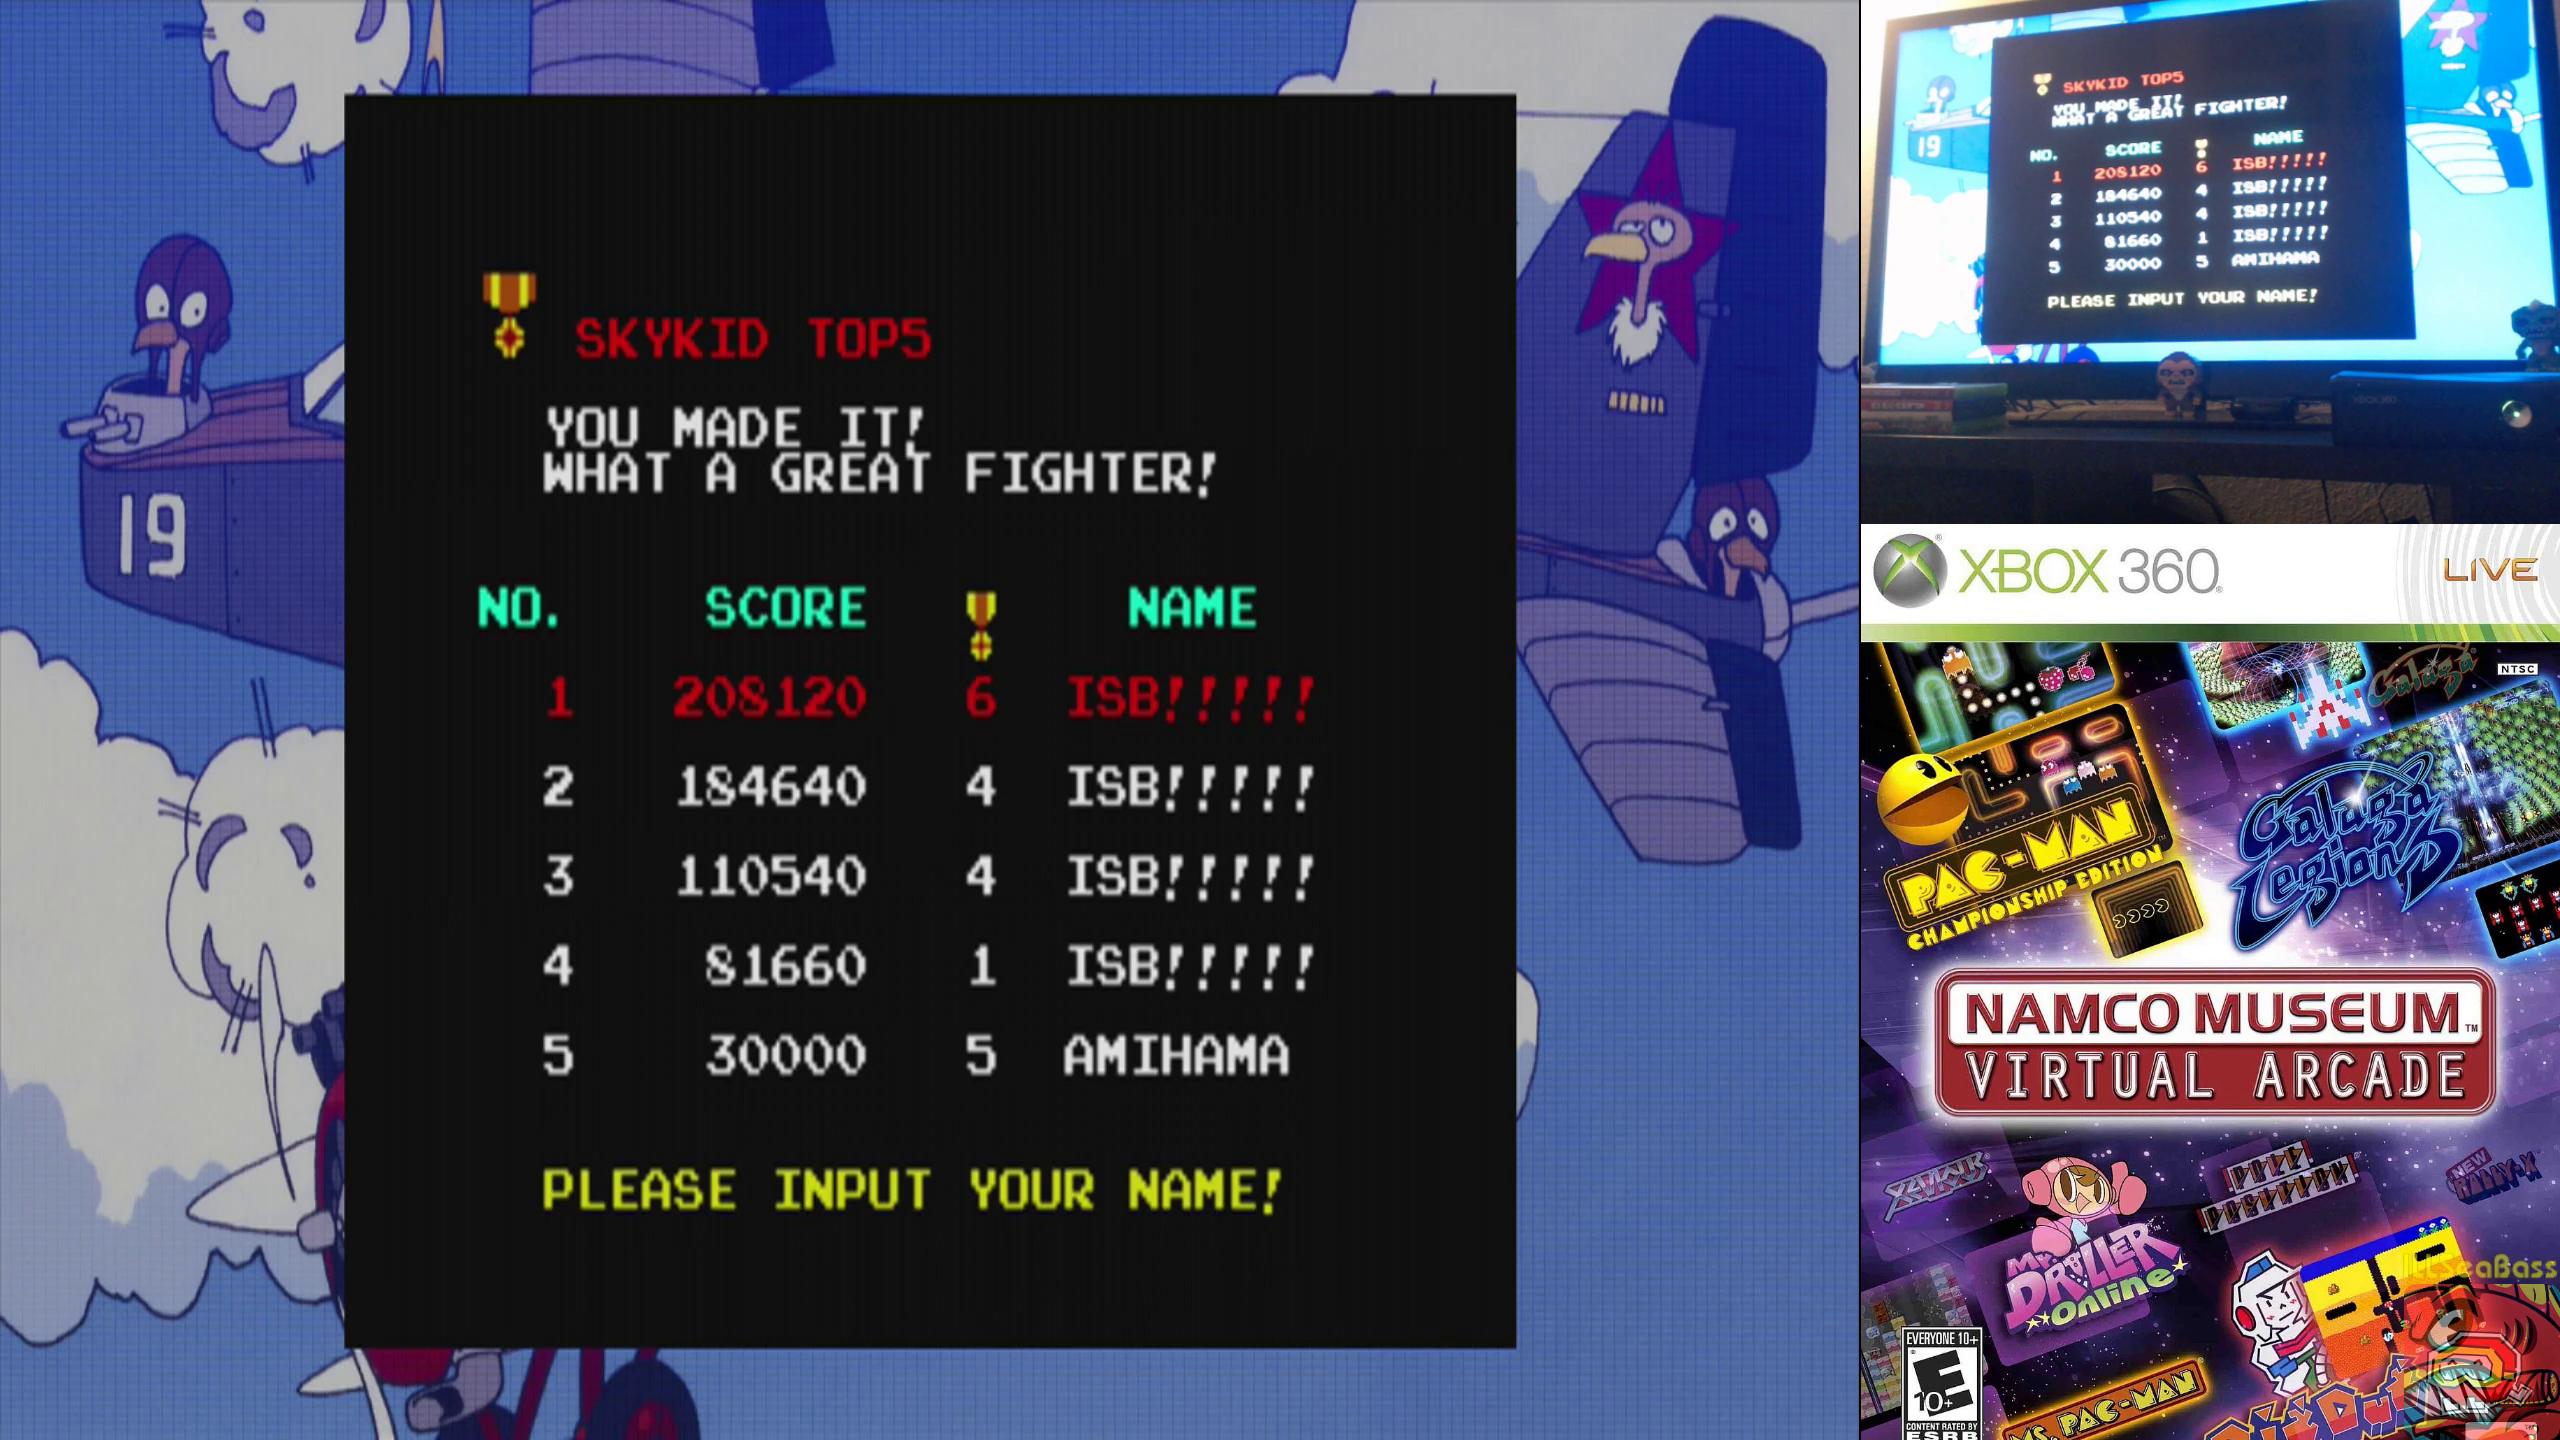 ILLSeaBass: Namco Muesum Virtual Arcade: Sky Kid (Xbox 360) 208,120 points on 2019-10-10 12:45:42